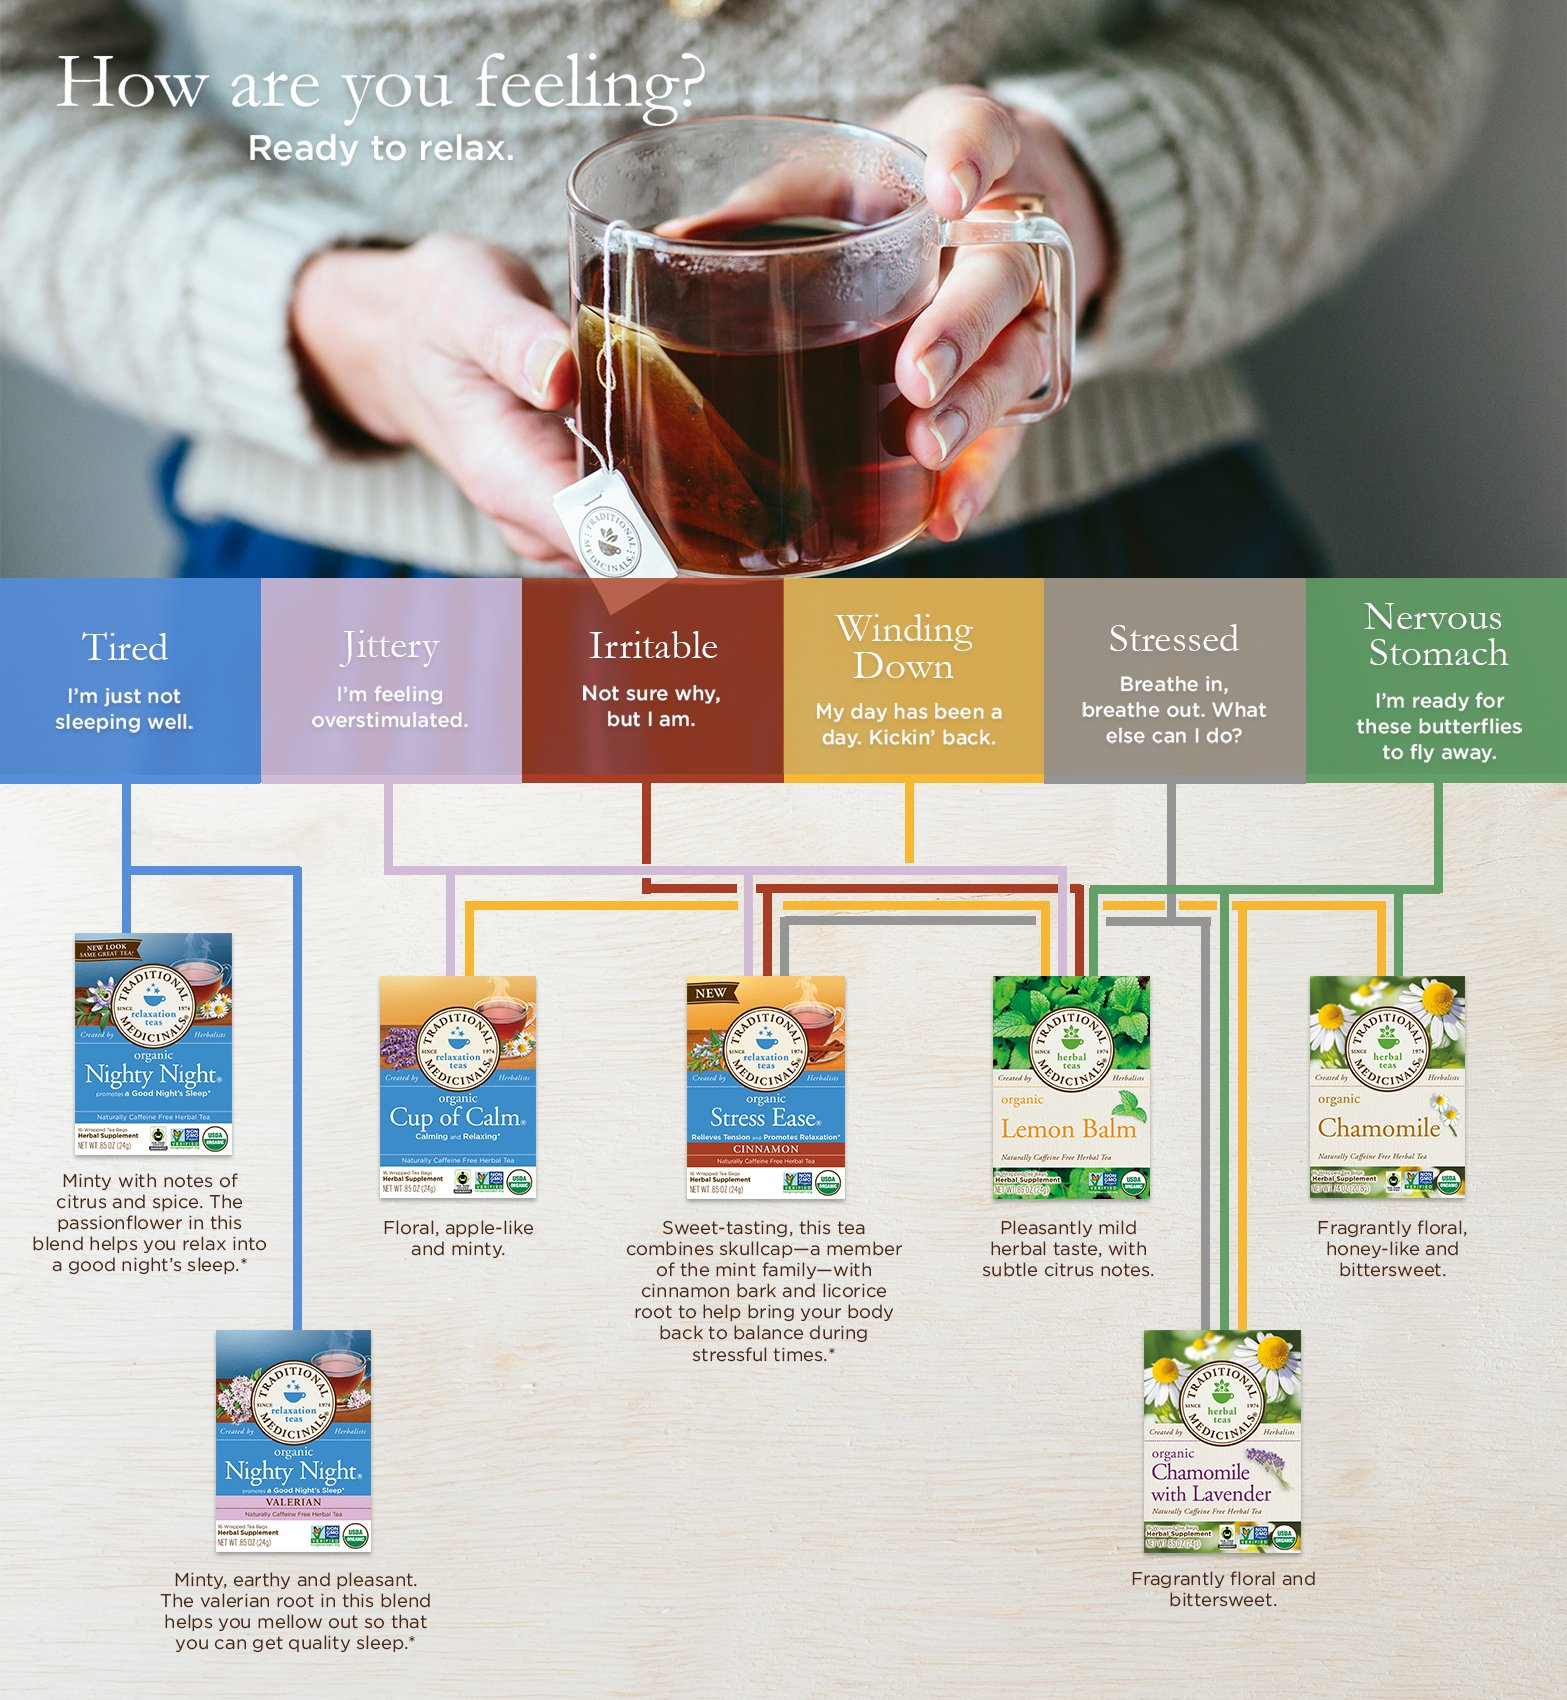 Traditional Medicinals Organic Lemon Balm Tea, 16 Tea Bags (Pack of1) by Traditional Medicinals (Image #2)